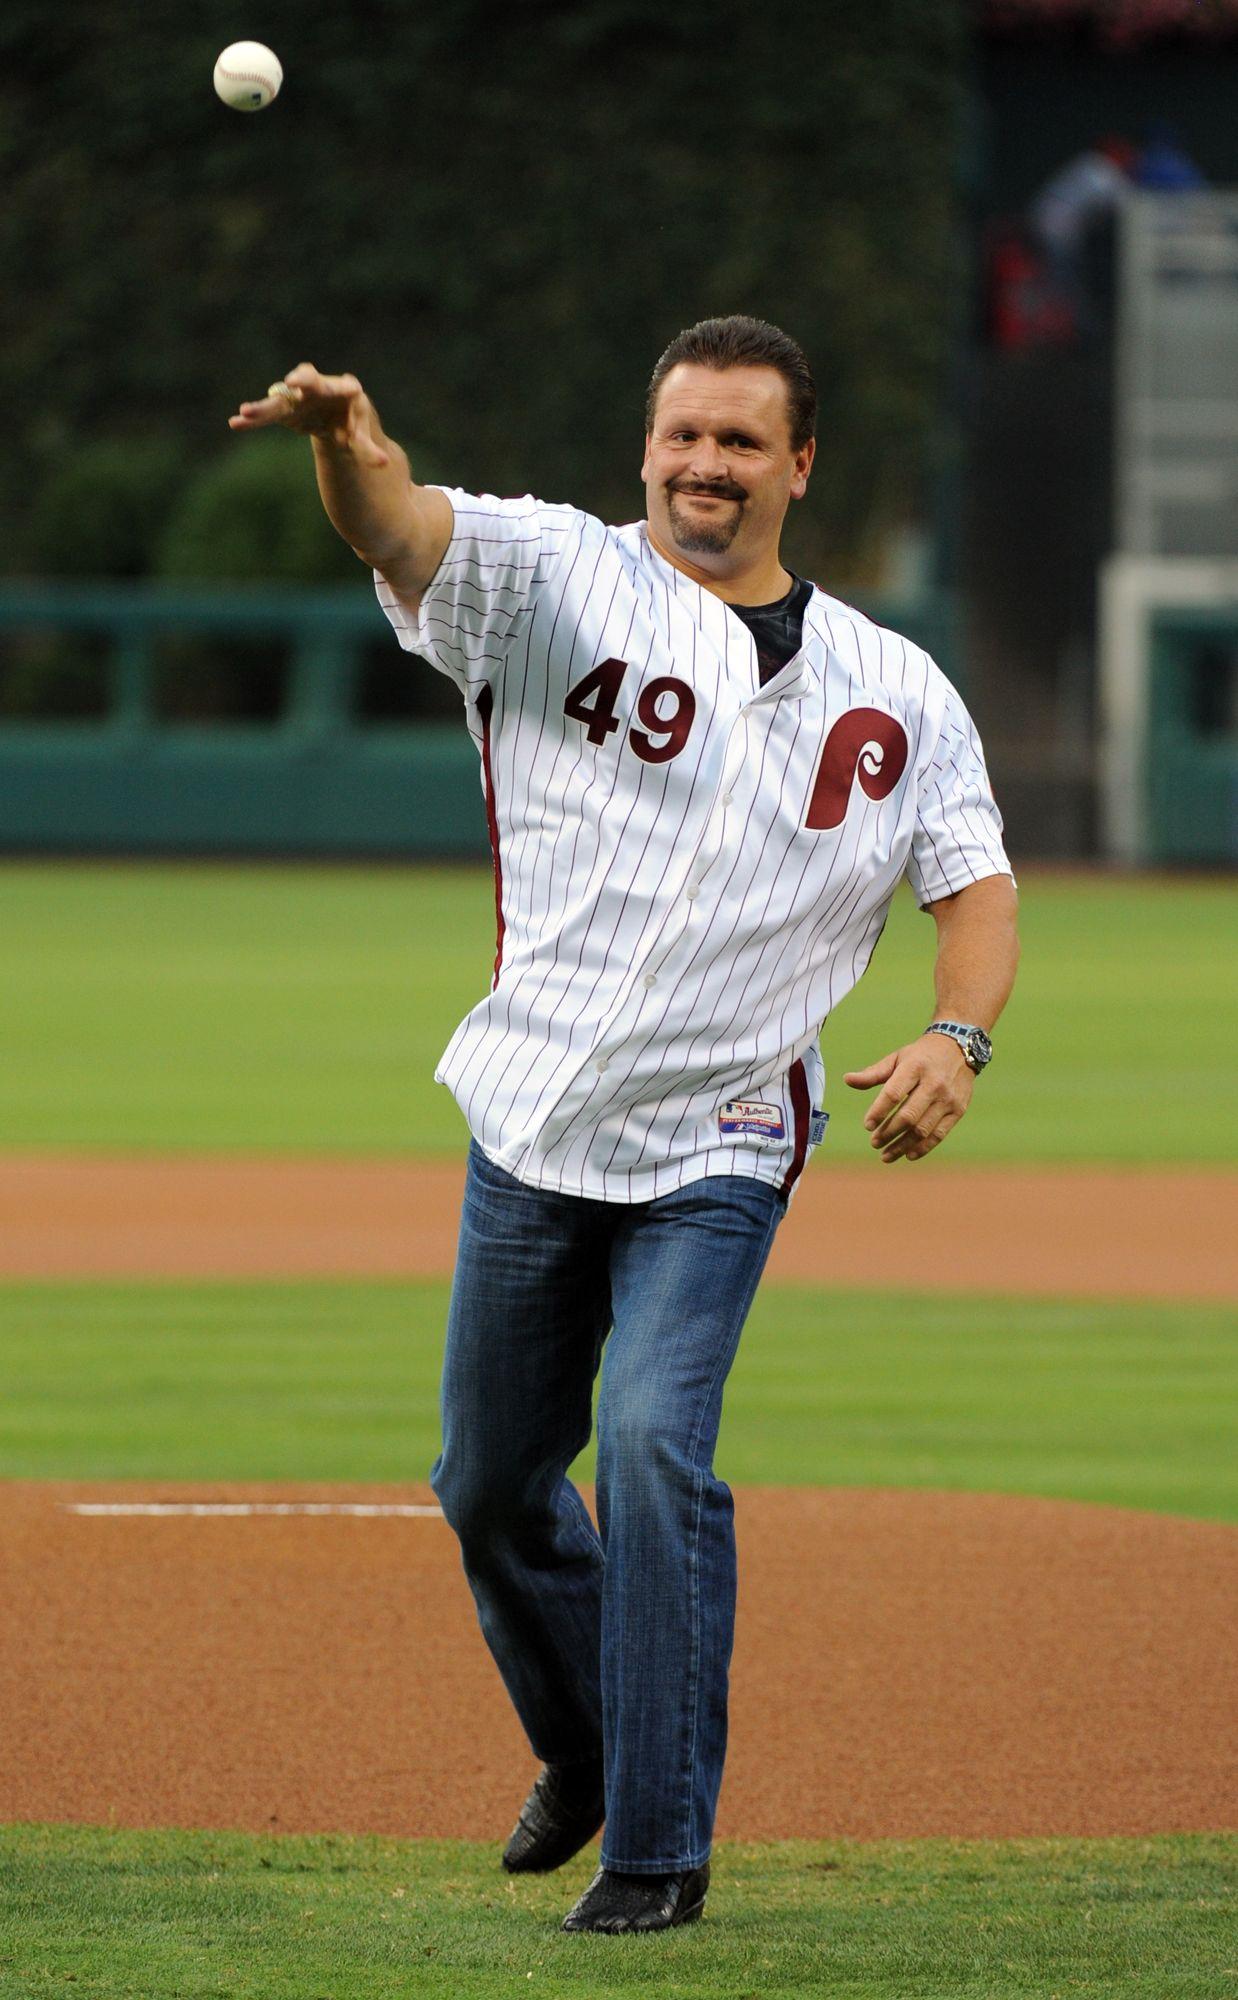 Phillies To Host 90s Retro Night On Wednesday Phillies Philadelphia Phillies Retro